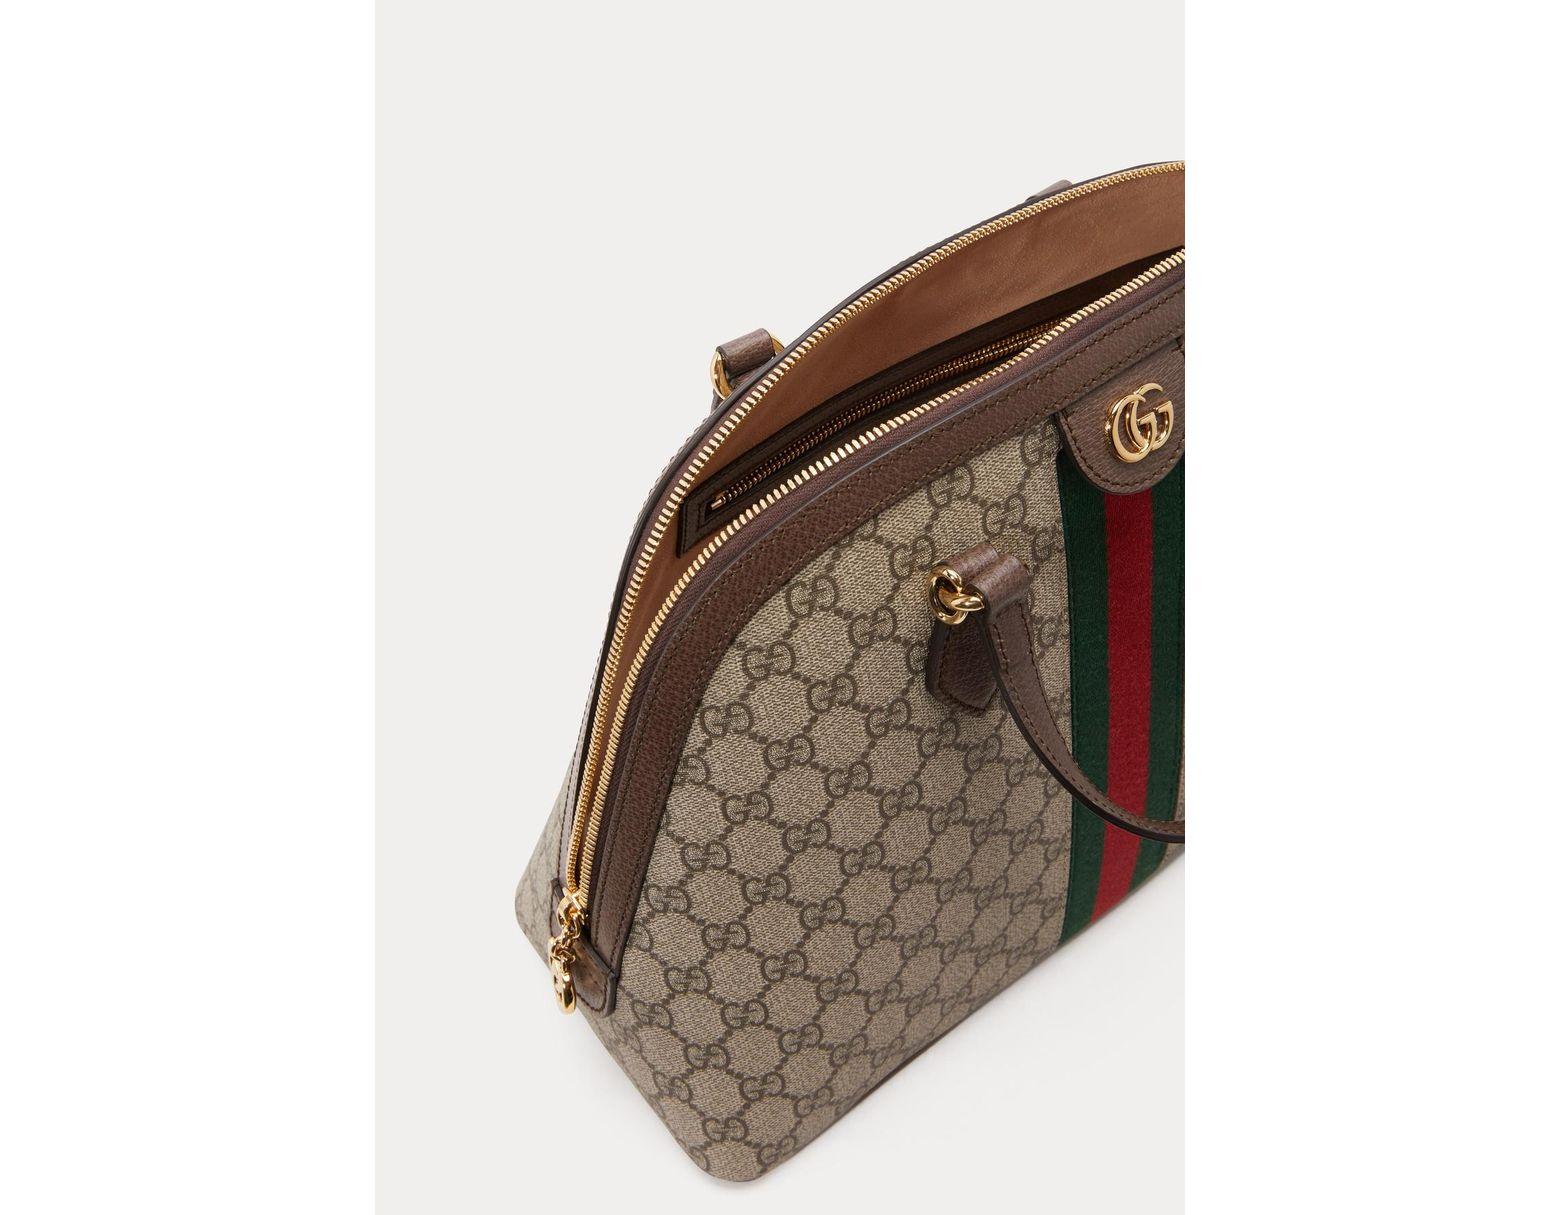 b9b20675c489 Gucci Ophidia GG Supreme Shoulder Bag in Natural - Lyst